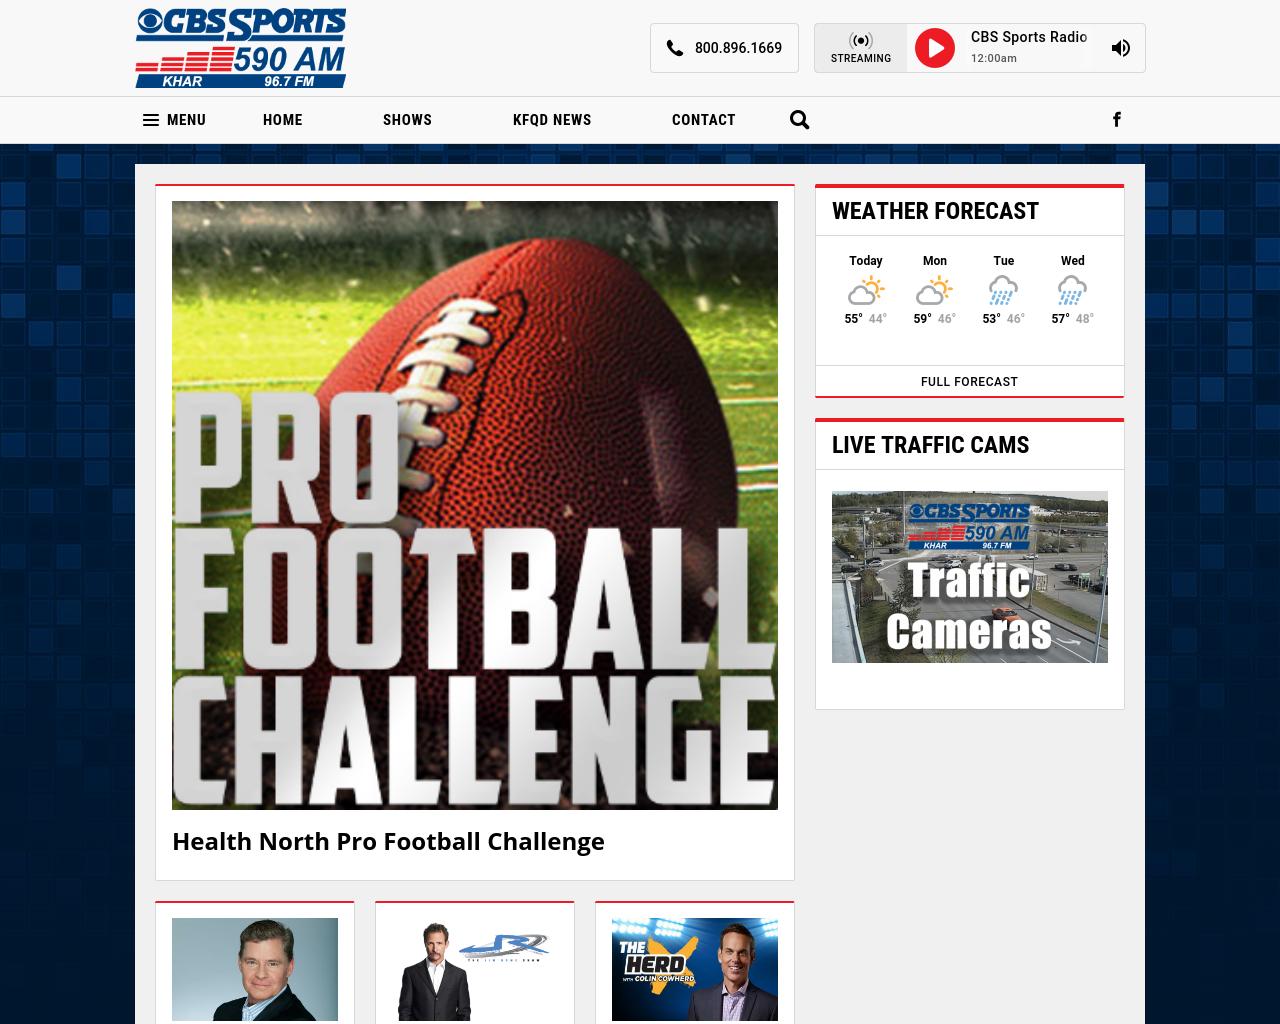 Sports-Radio-590-KHAR-Advertising-Reviews-Pricing